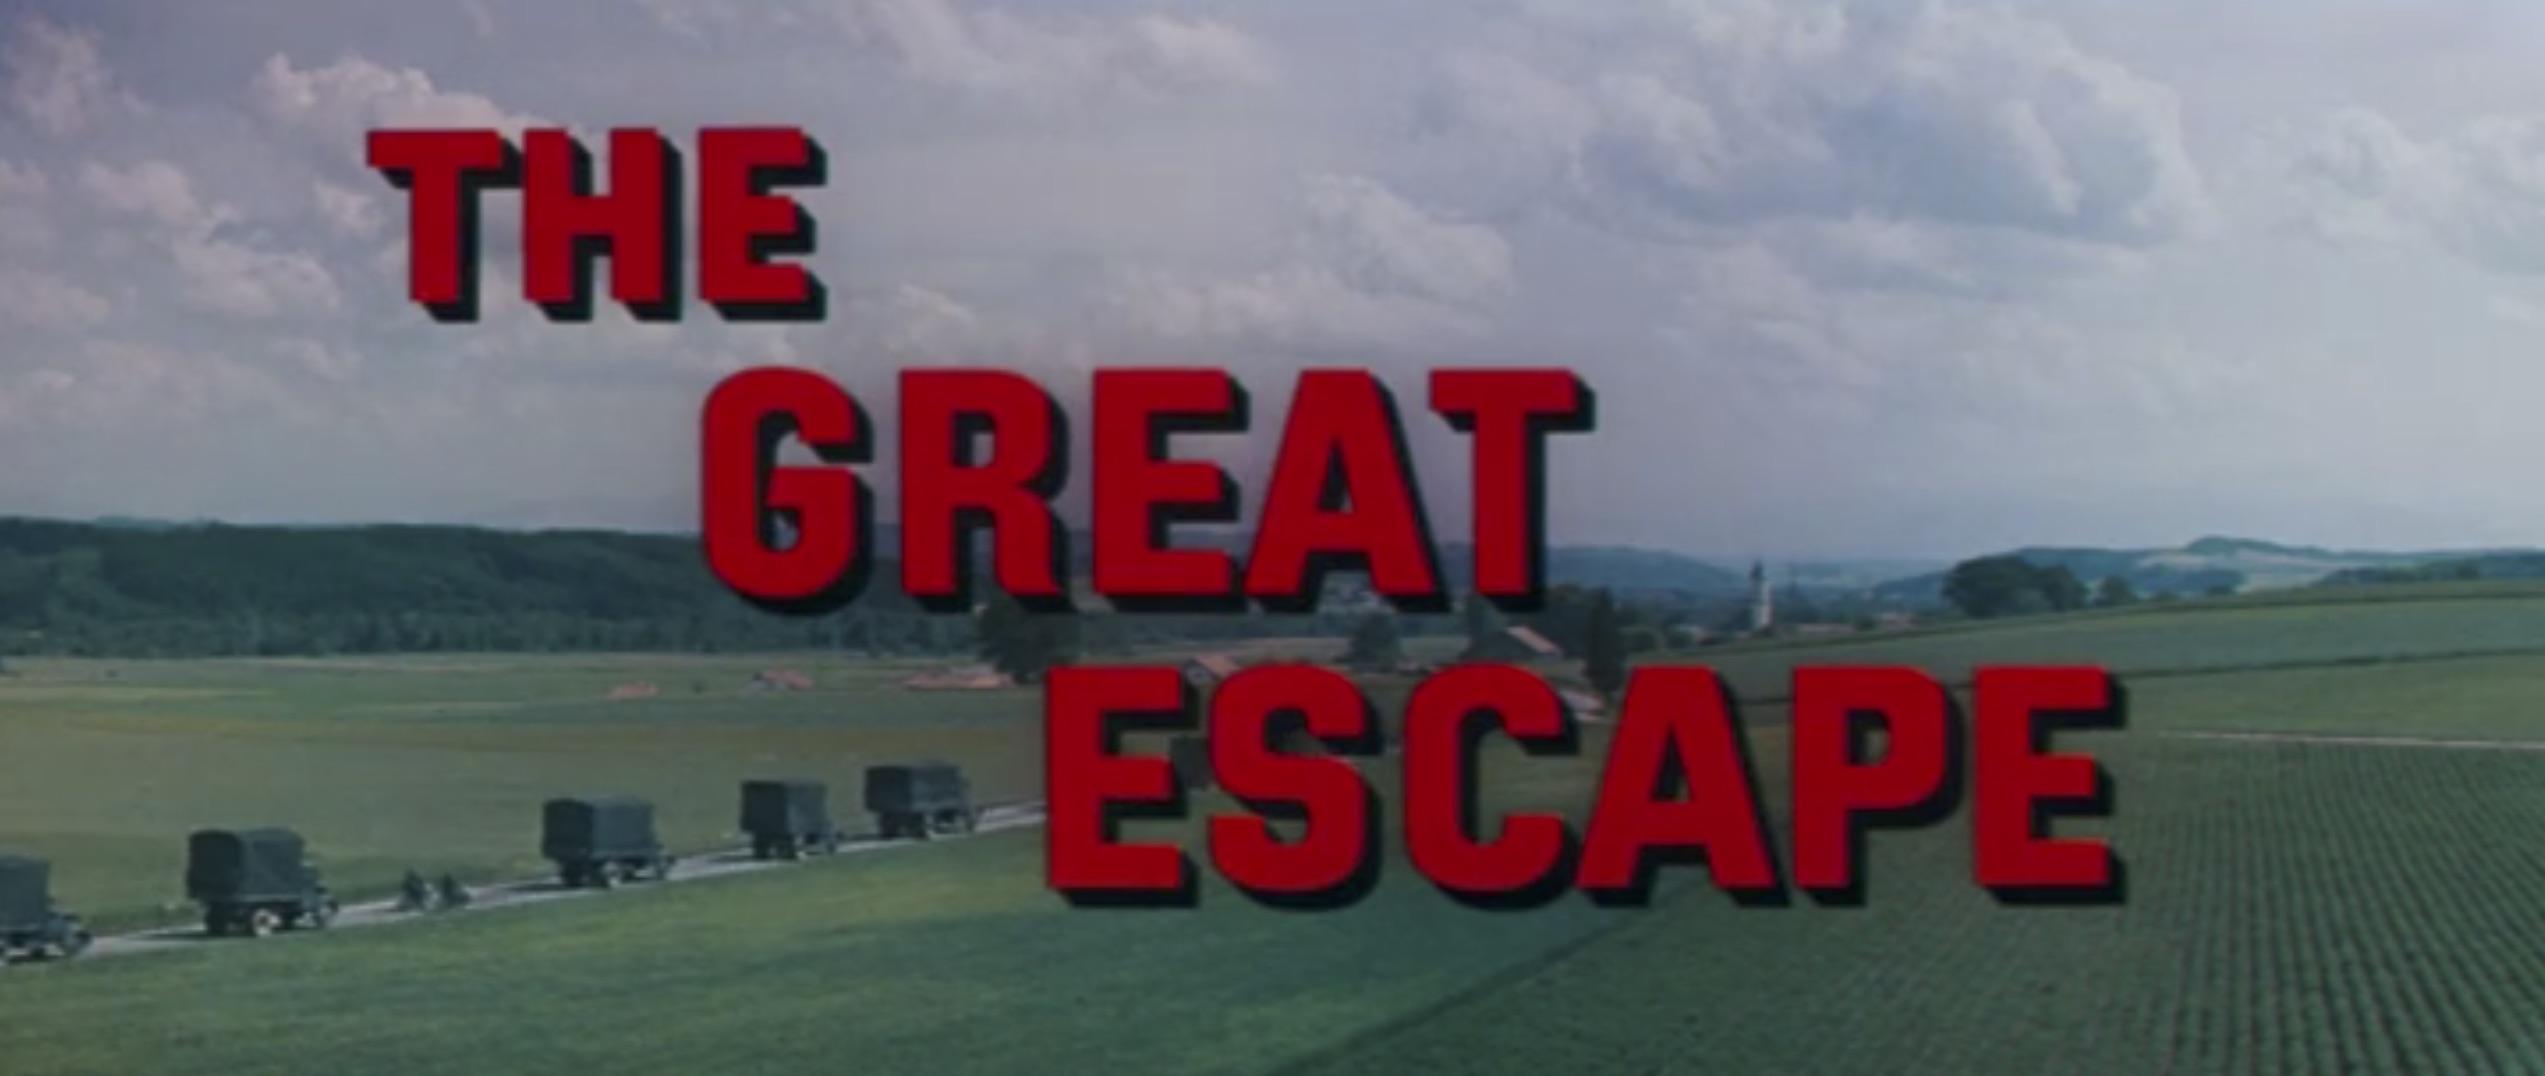 The Great Escape title screen